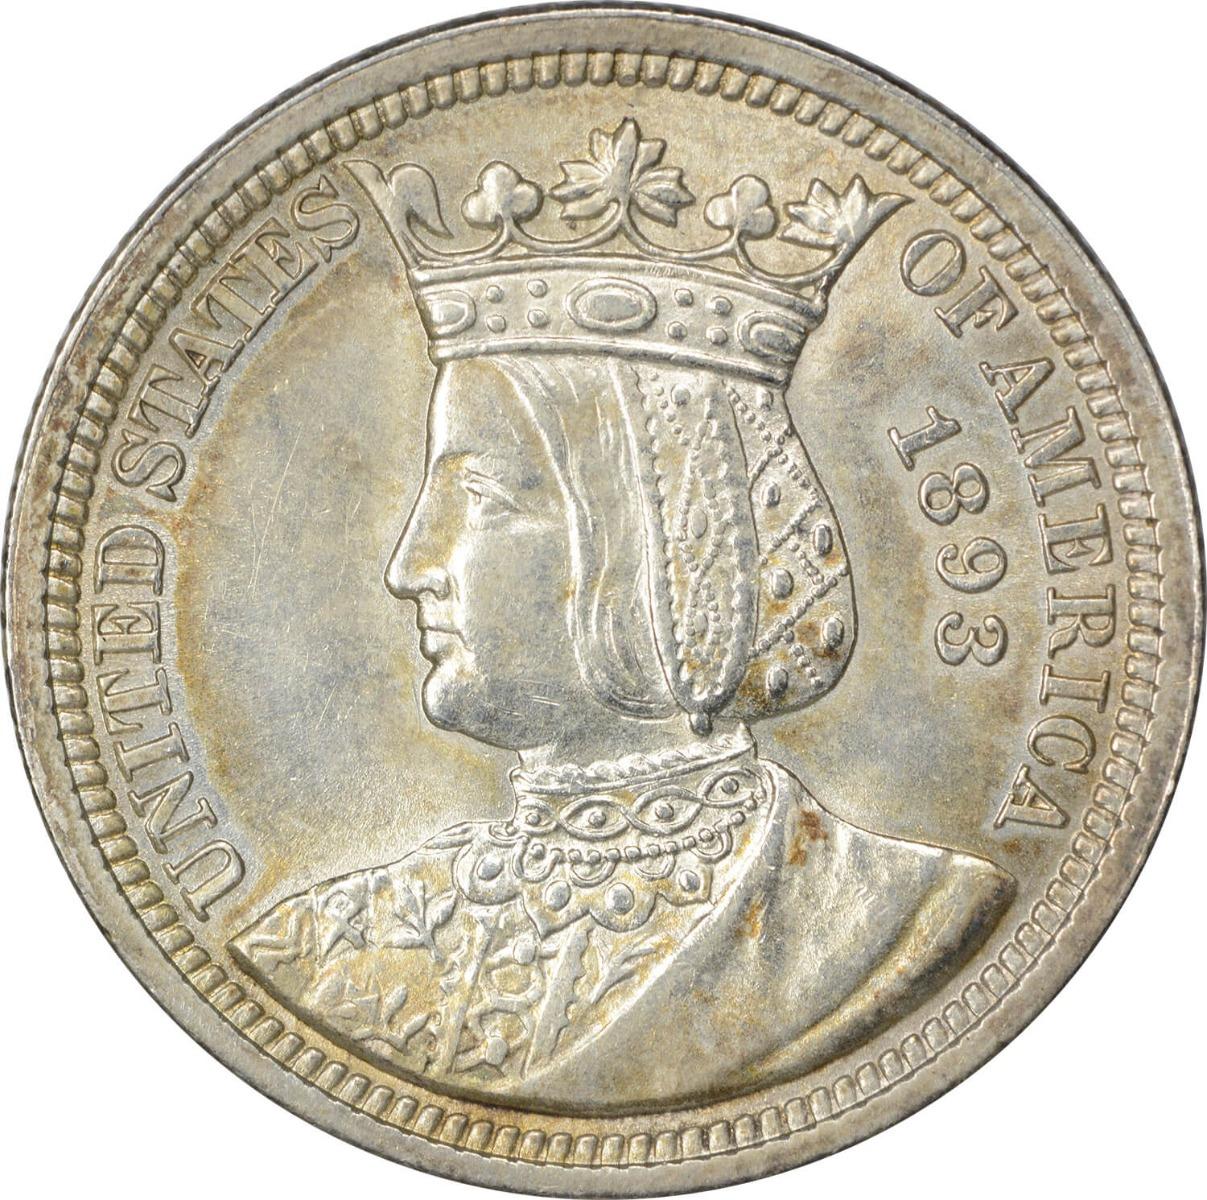 1893 Isabella Commemorative Quarter, AU, Uncertified